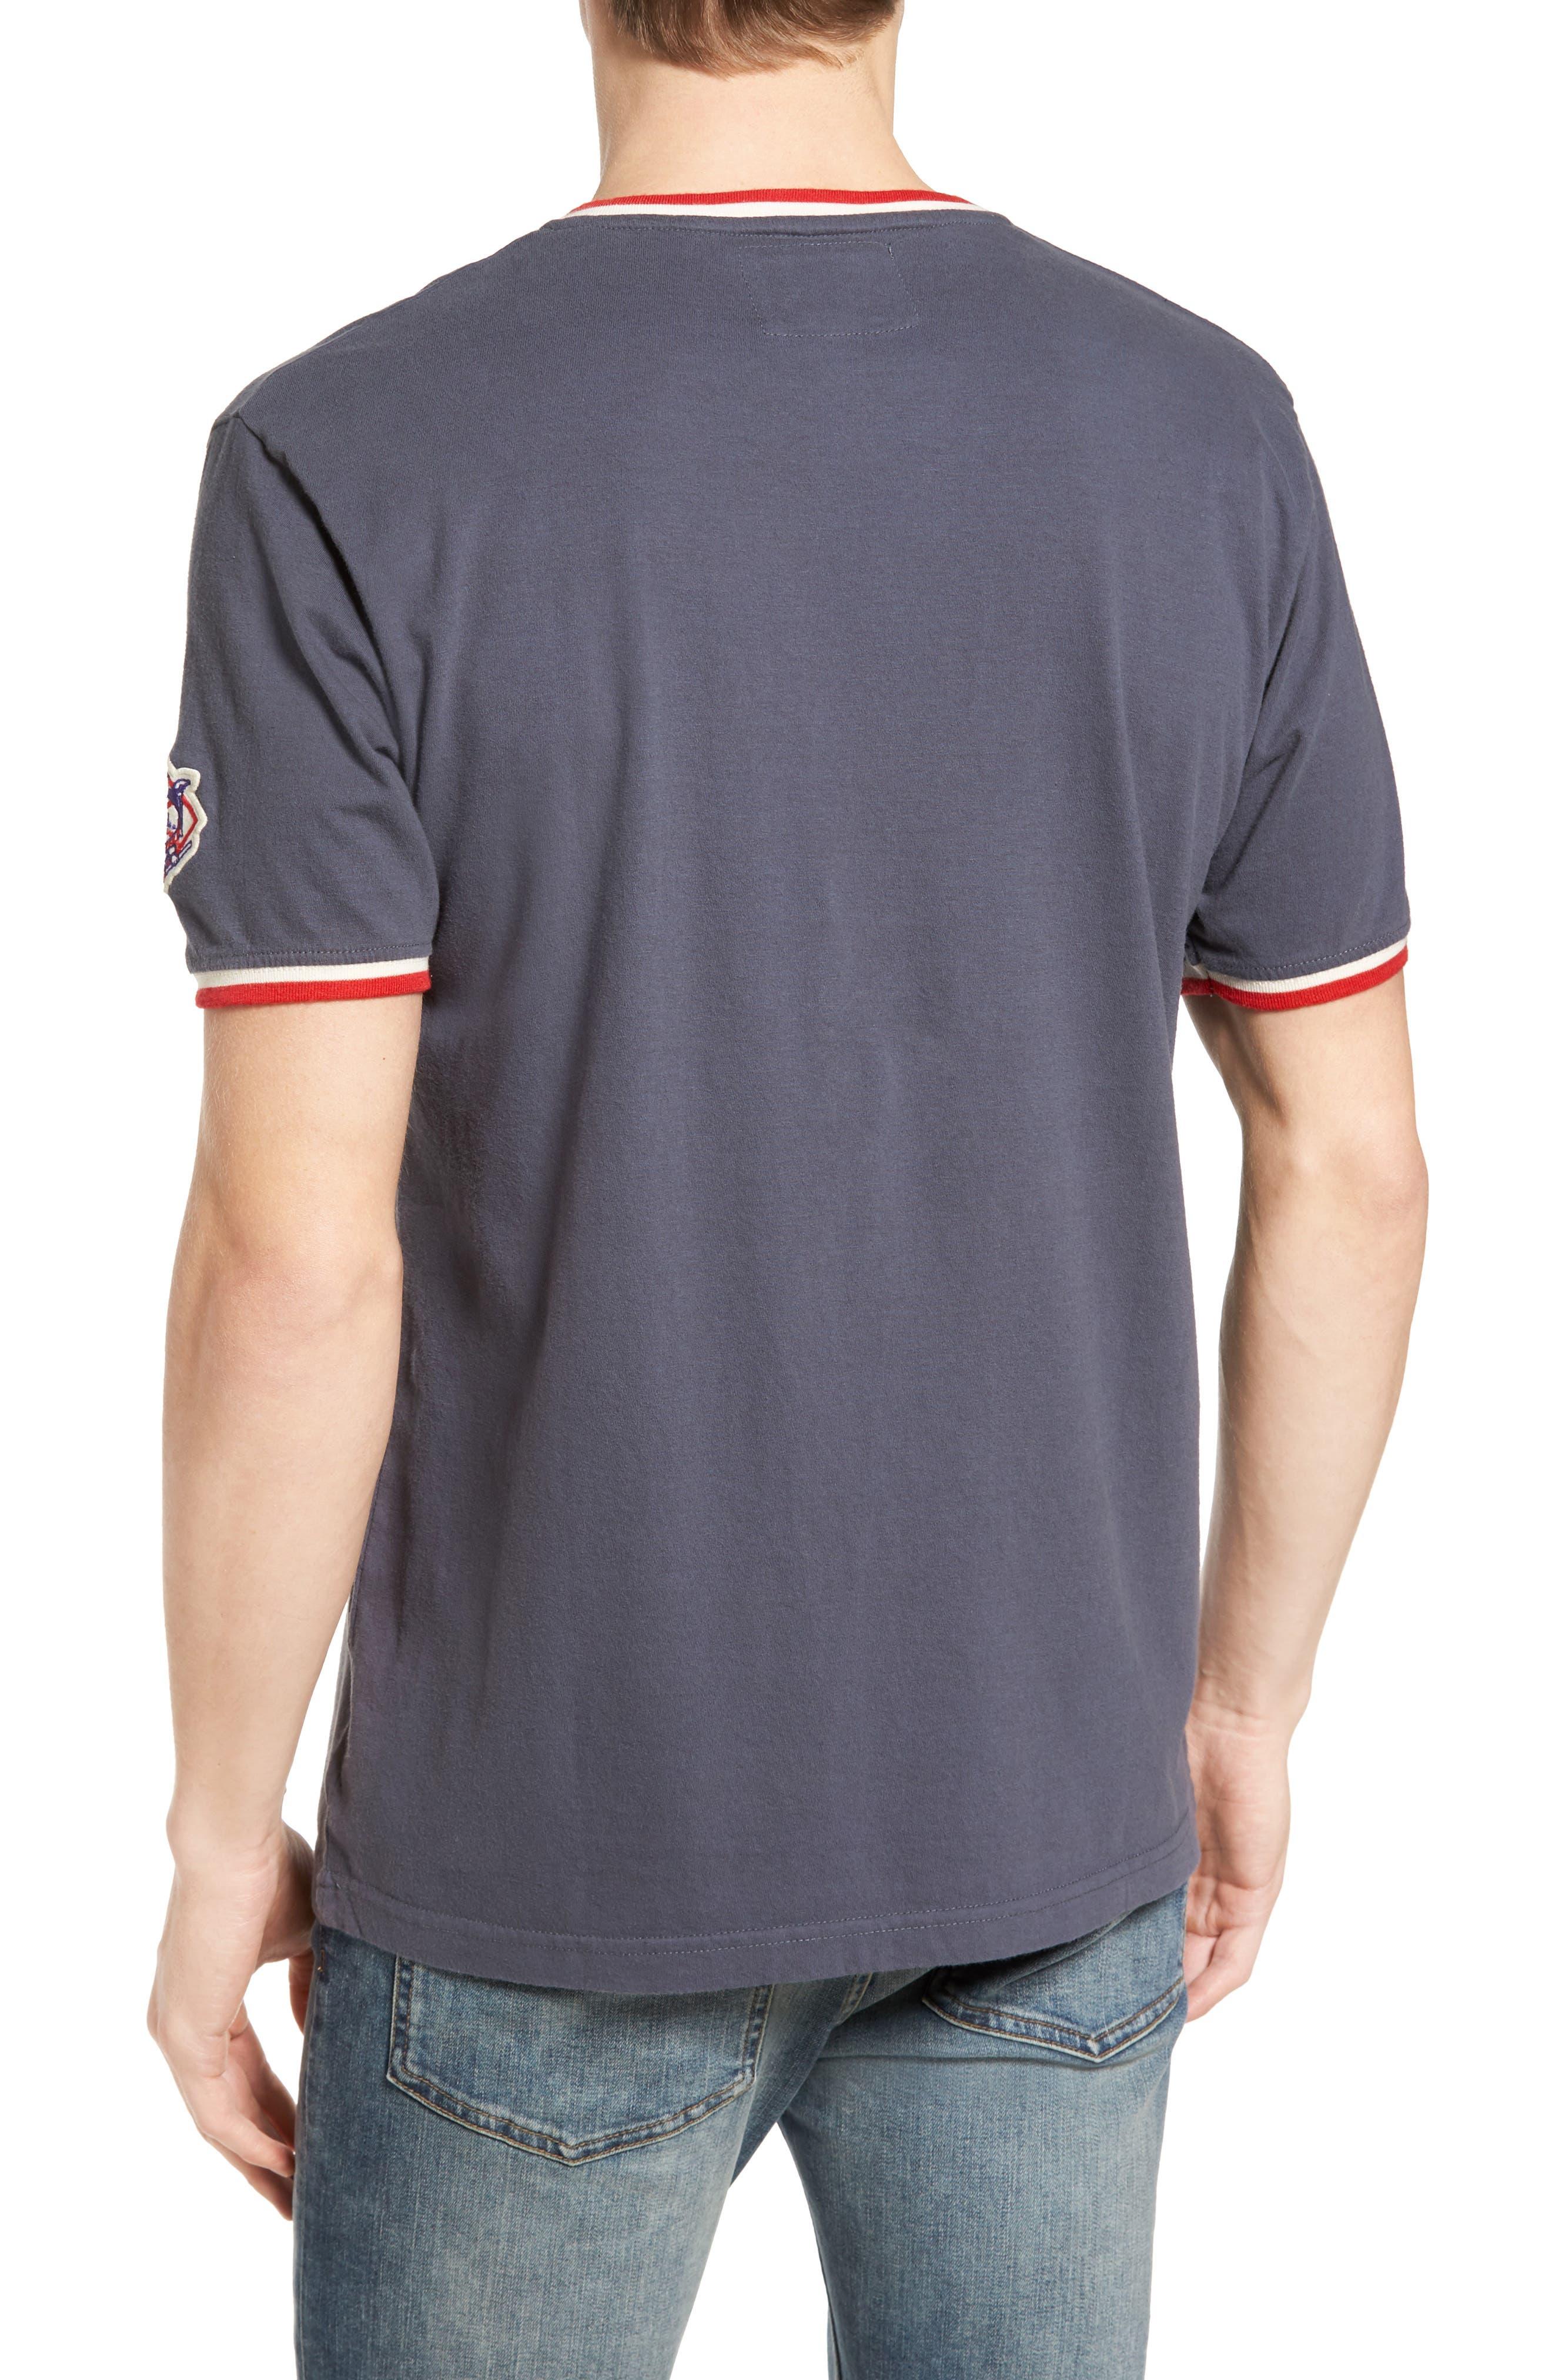 Eastwood Washington Nationals T-Shirt,                             Alternate thumbnail 2, color,                             410